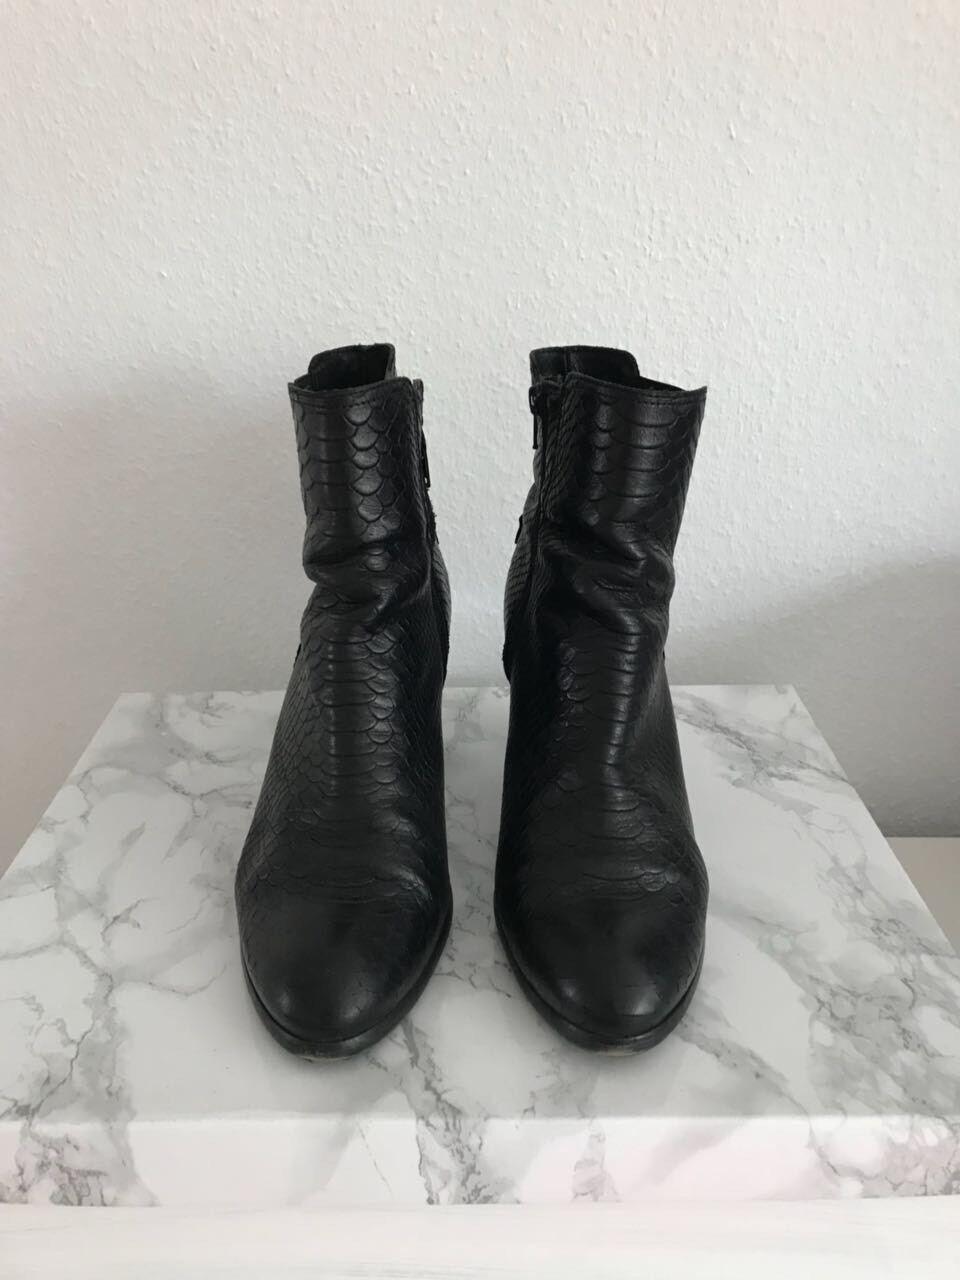 TEXTO Echtleder Leder schwarz Lederschuh Stiefelette schwarz Leder Größe 41 a491b3